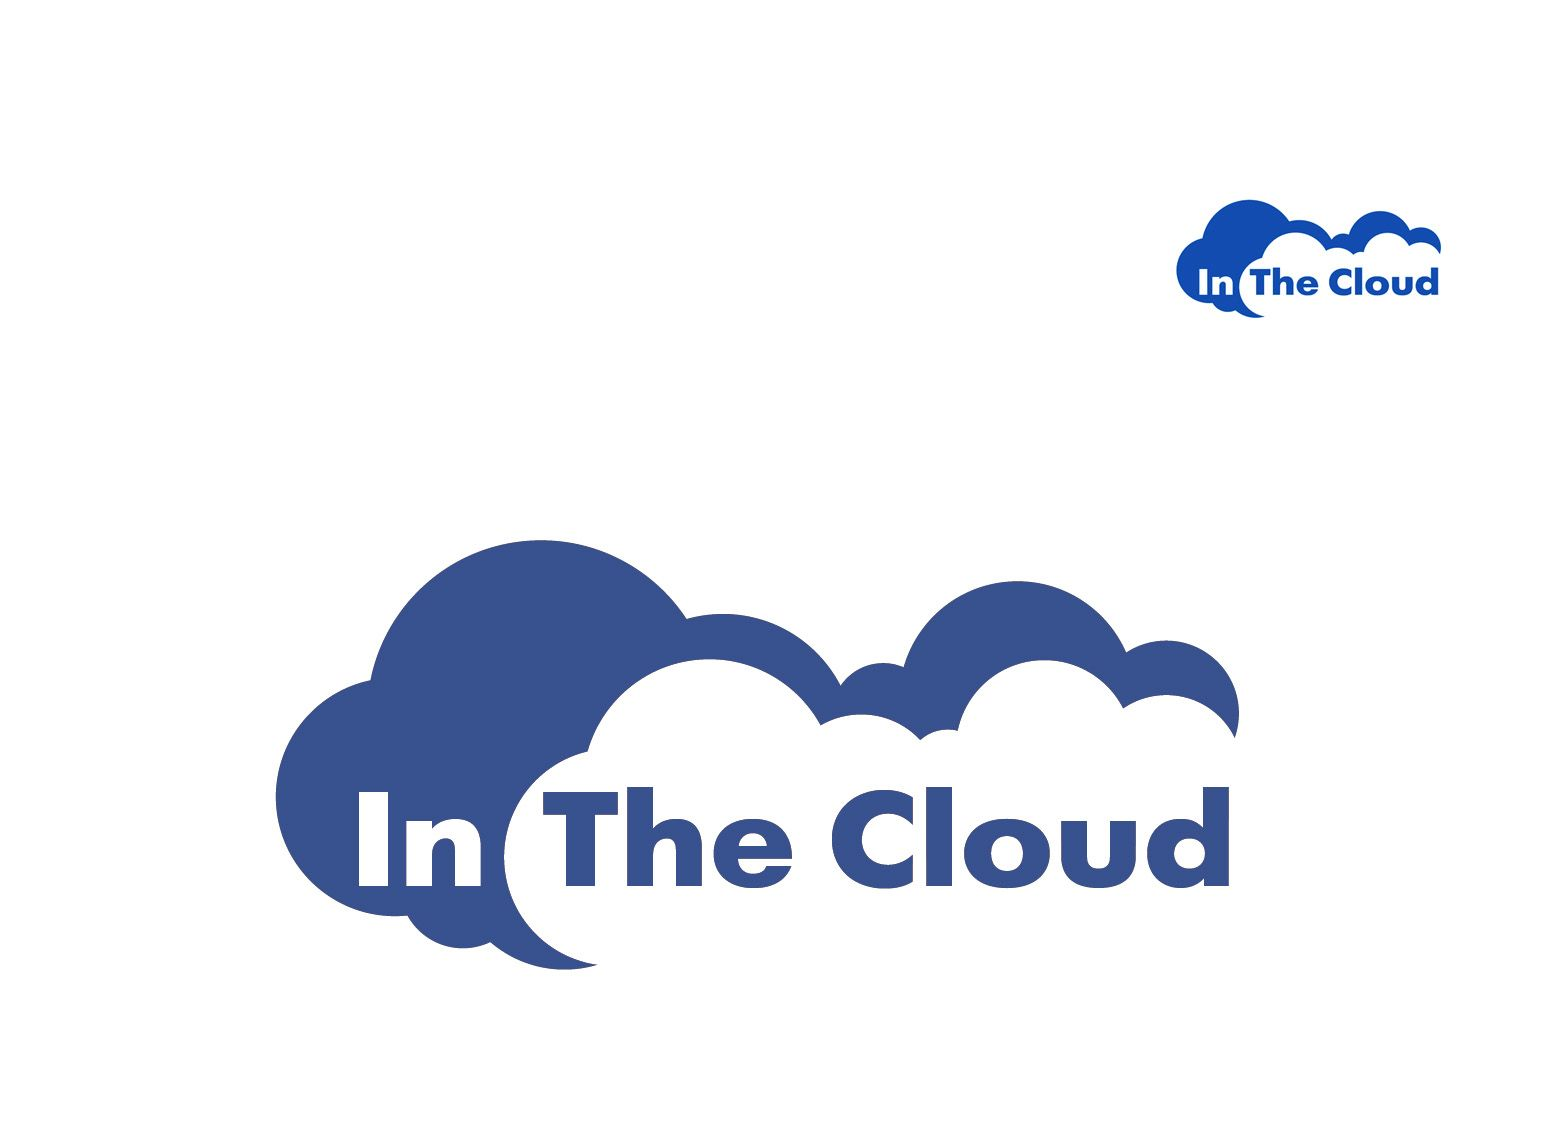 Логотип ИТ-компании InTheCloud - дизайнер BRUINISHE